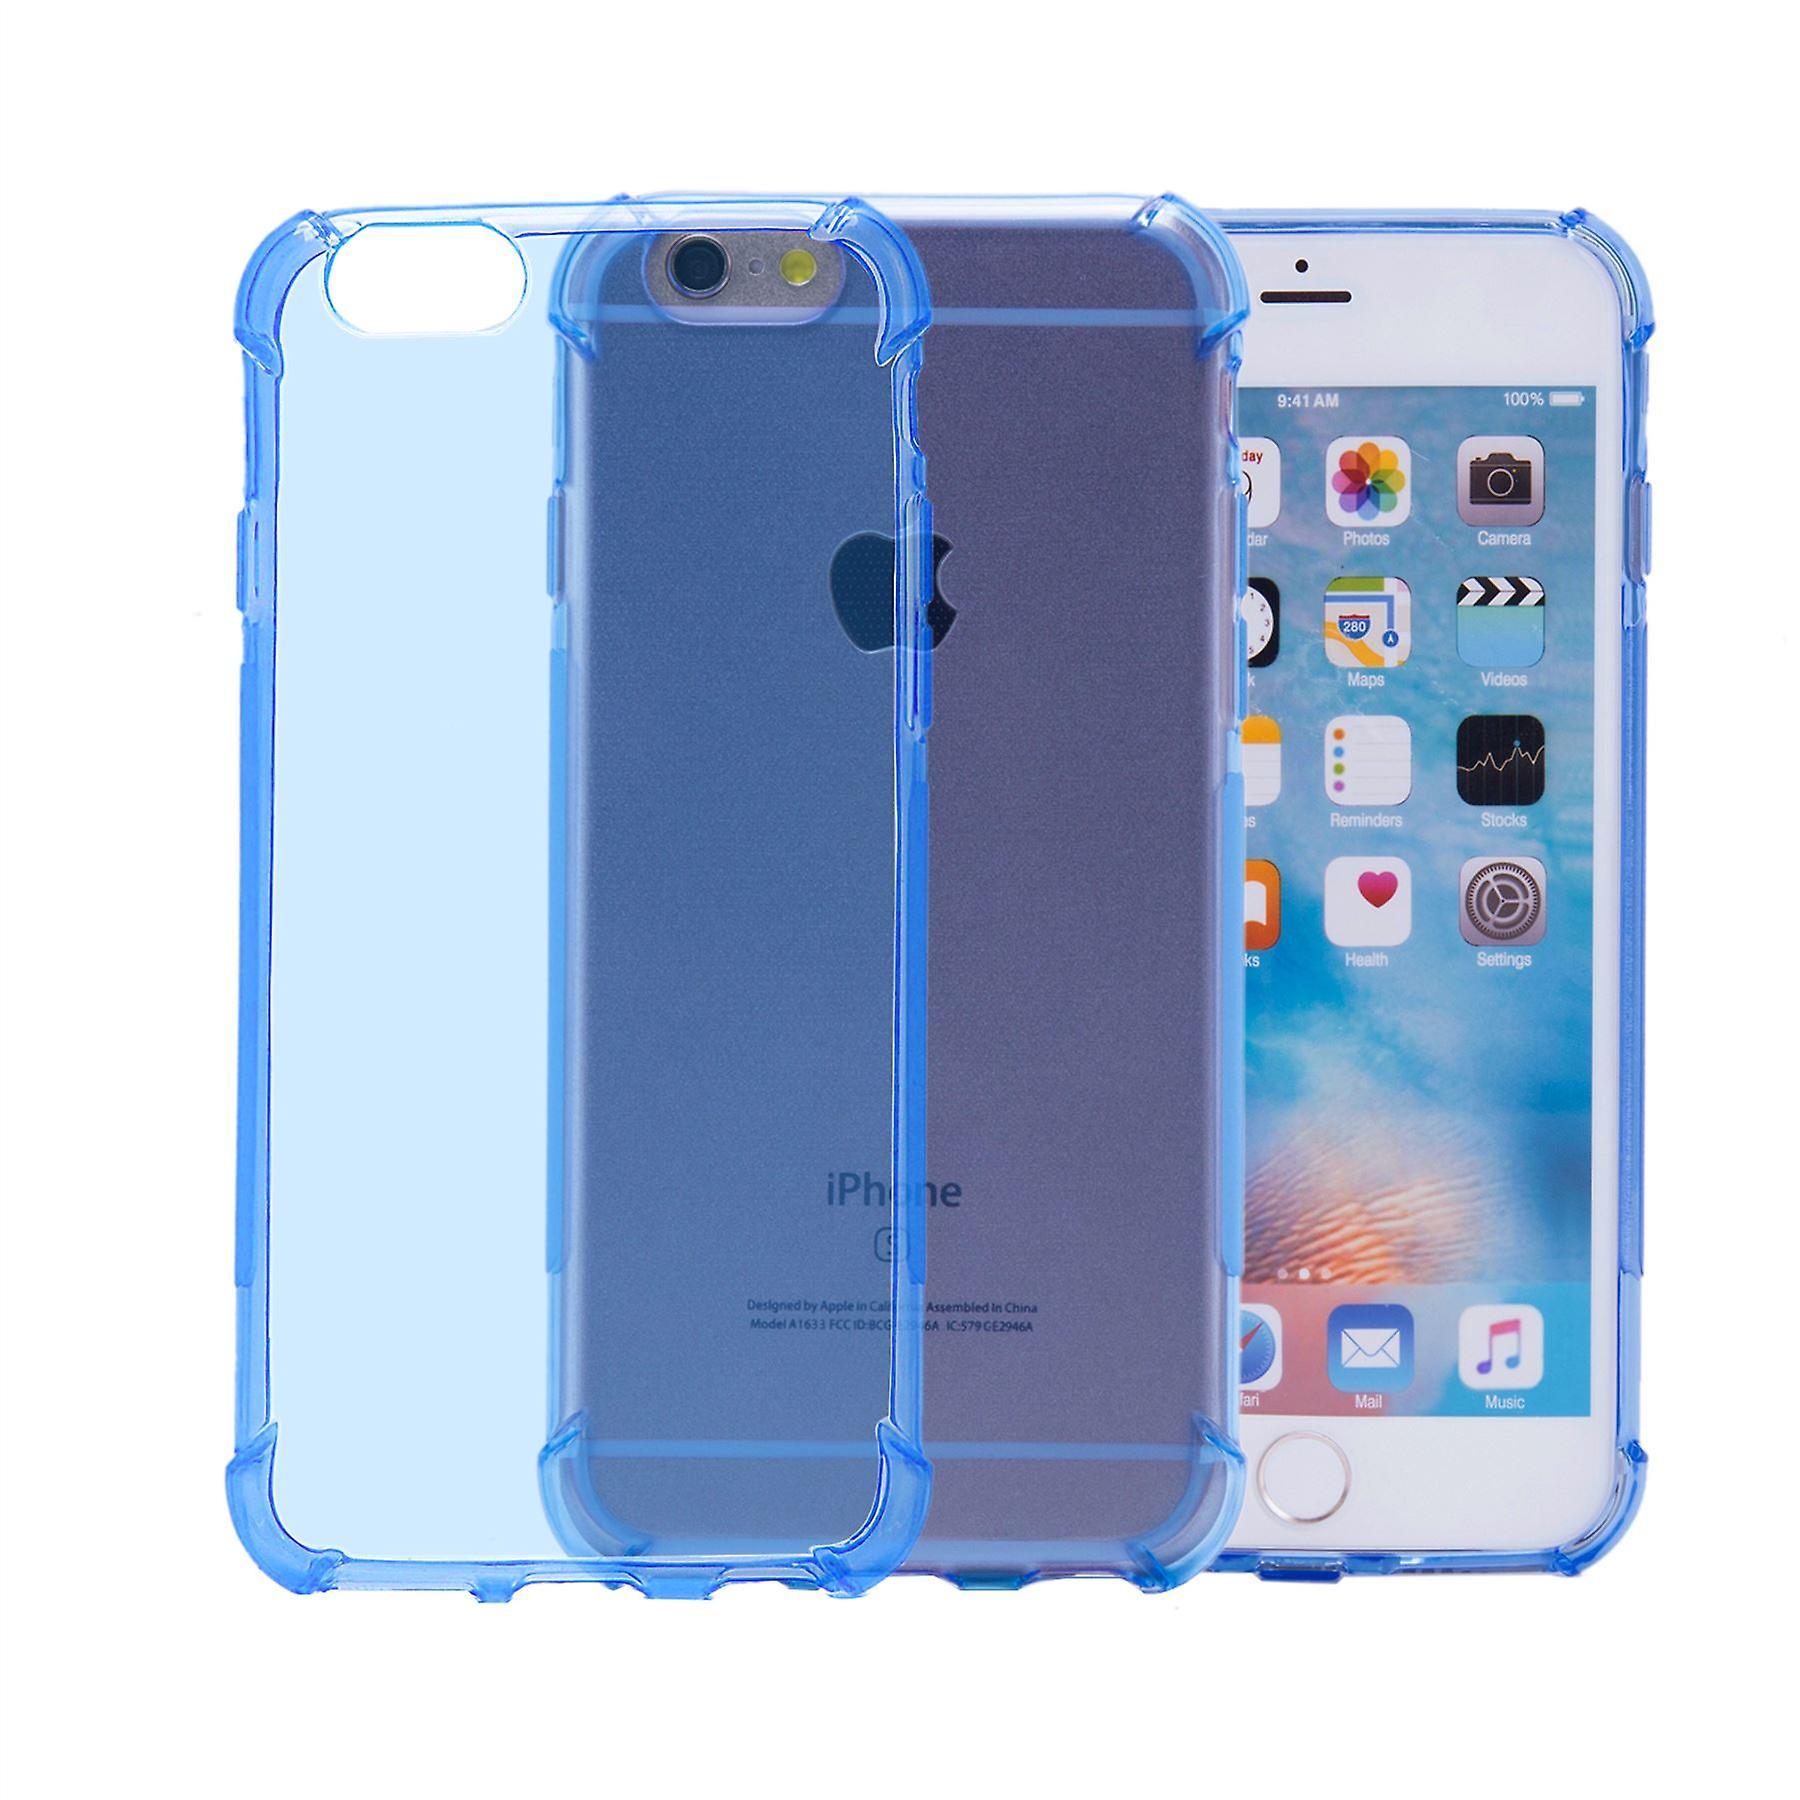 Tough Gel case for Apple iPhone 6 6S - Light Blue